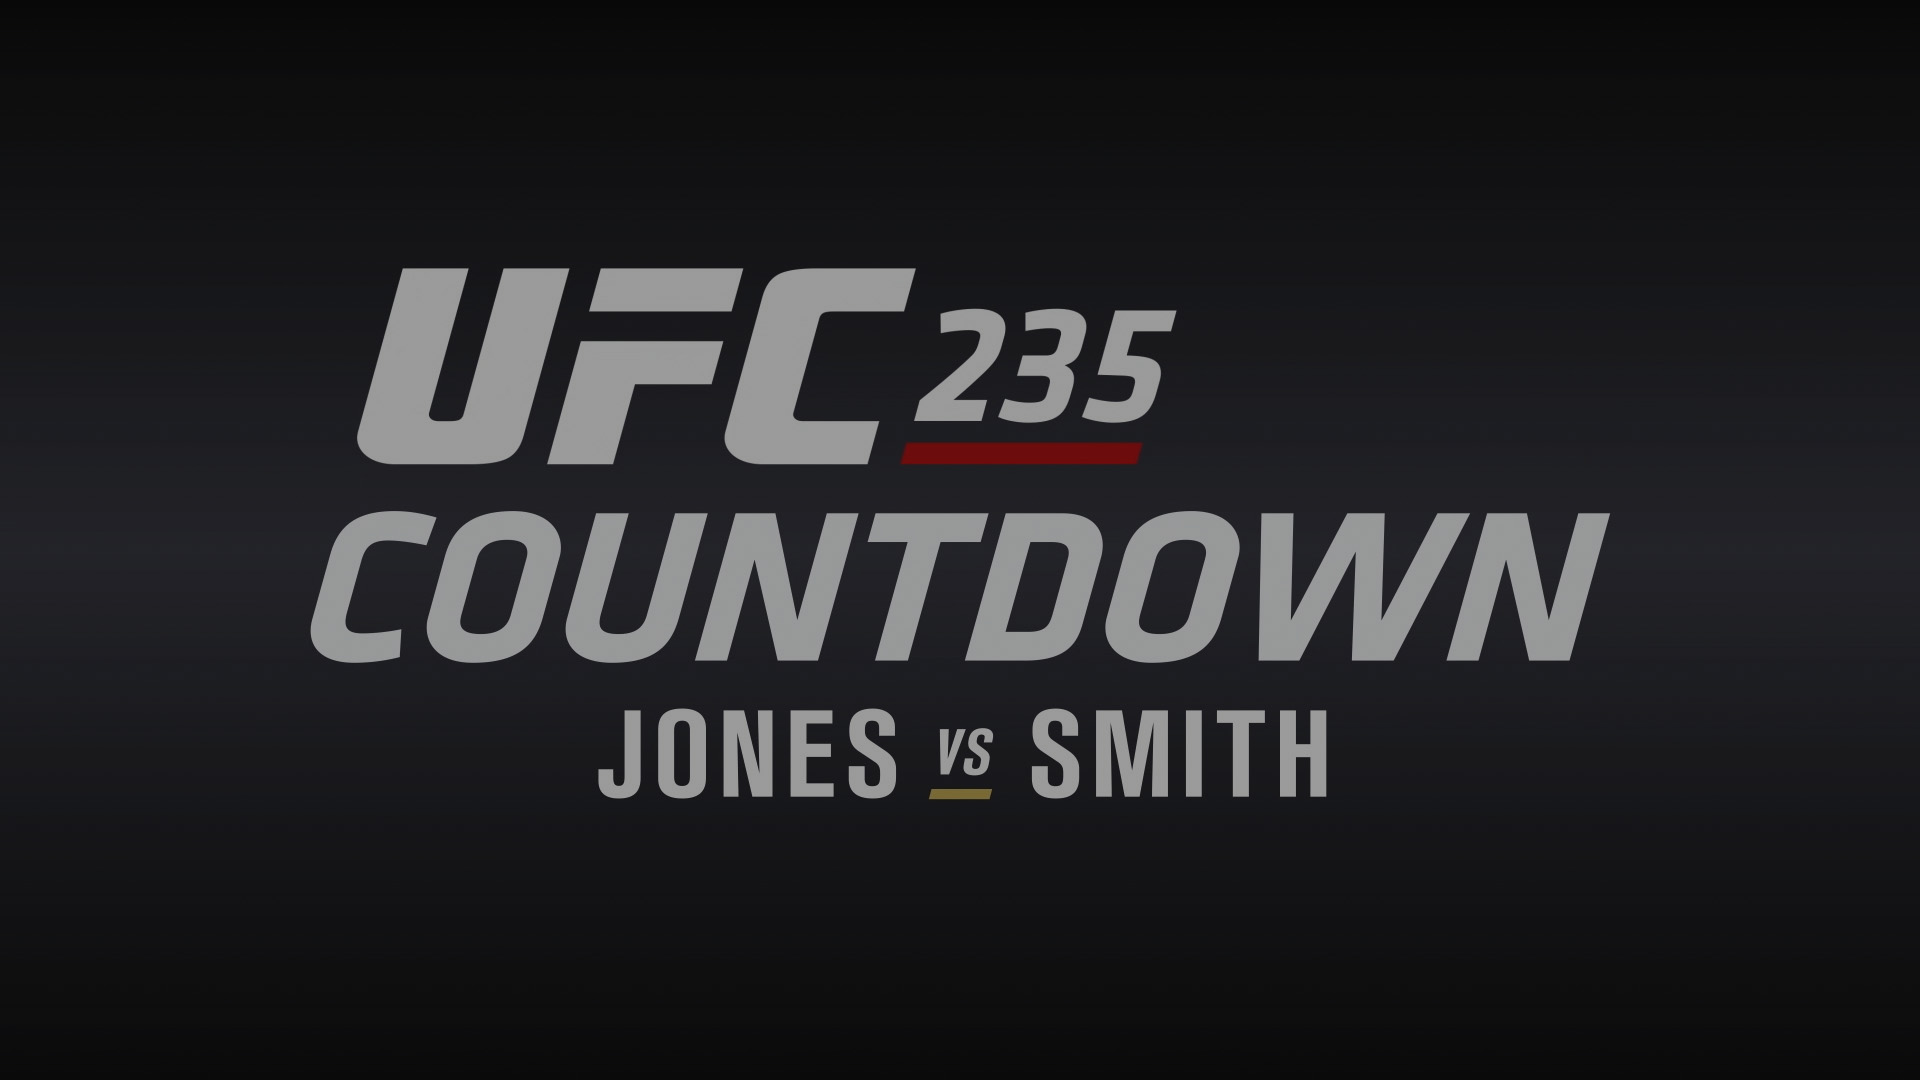 UFC 235 Countdown Full Episode UFC 1920x1080